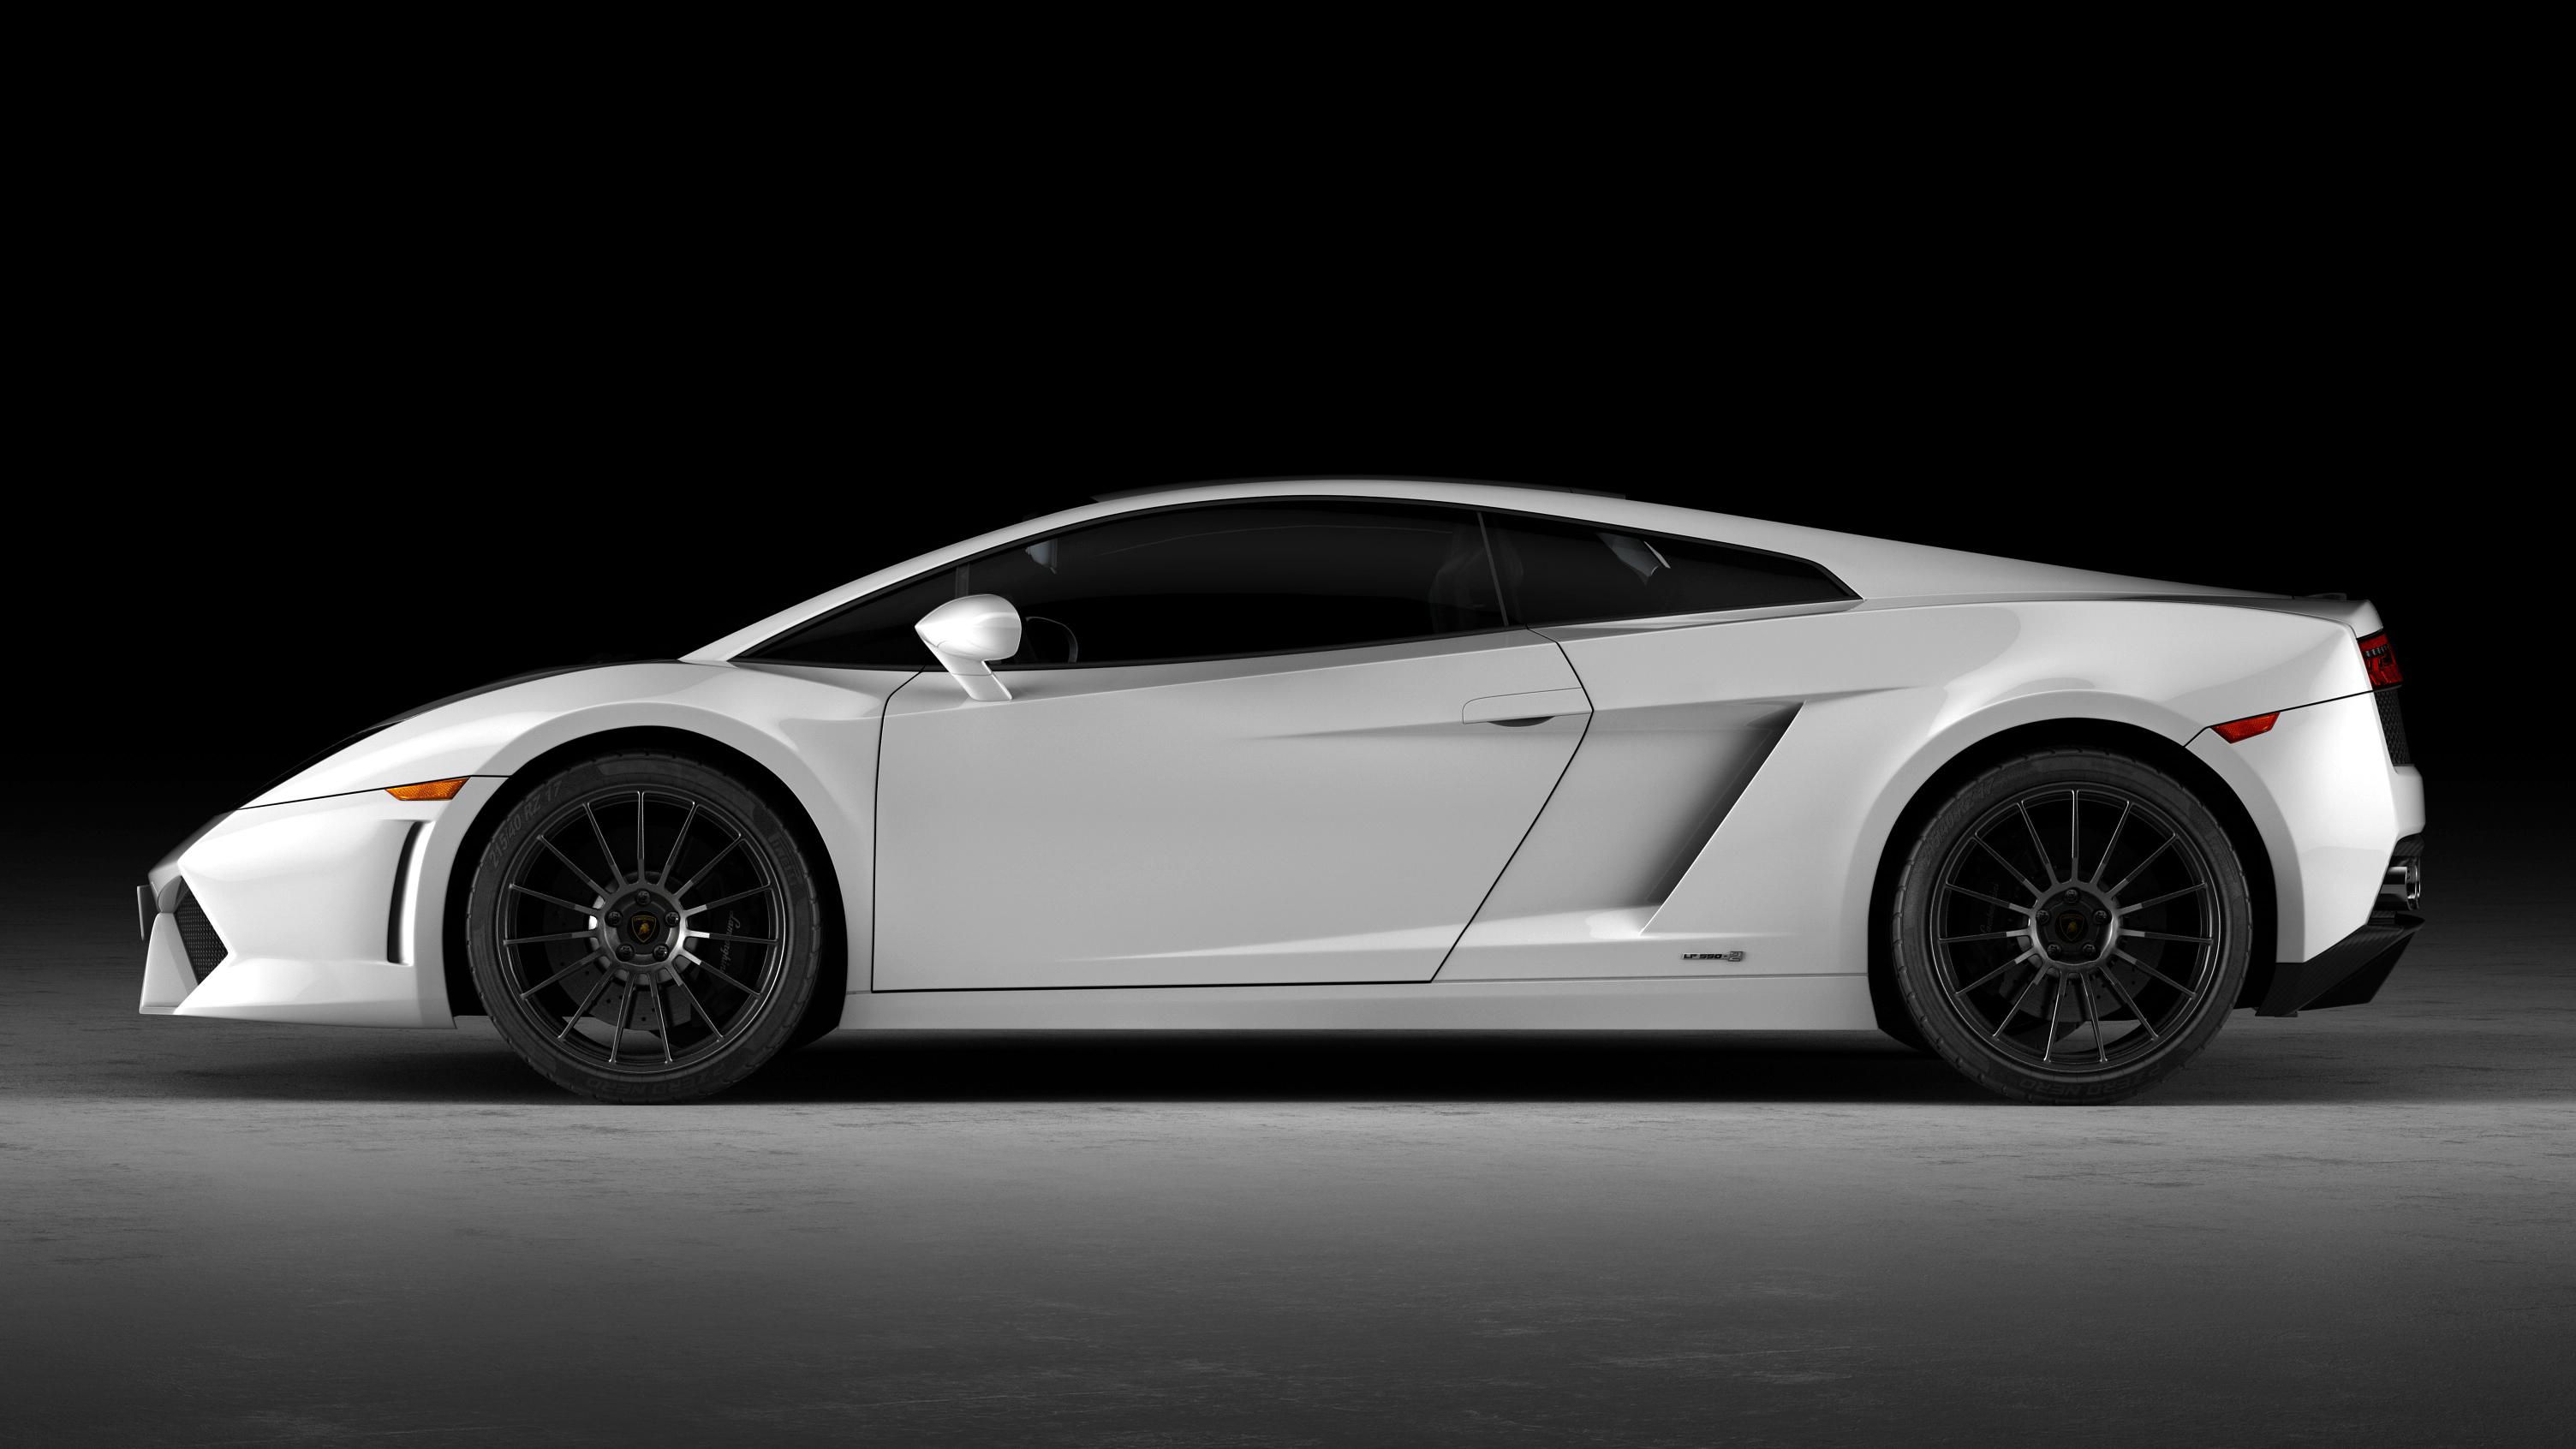 Lamborghini Gallardo Lp 550 2 By Laffonte On Deviantart